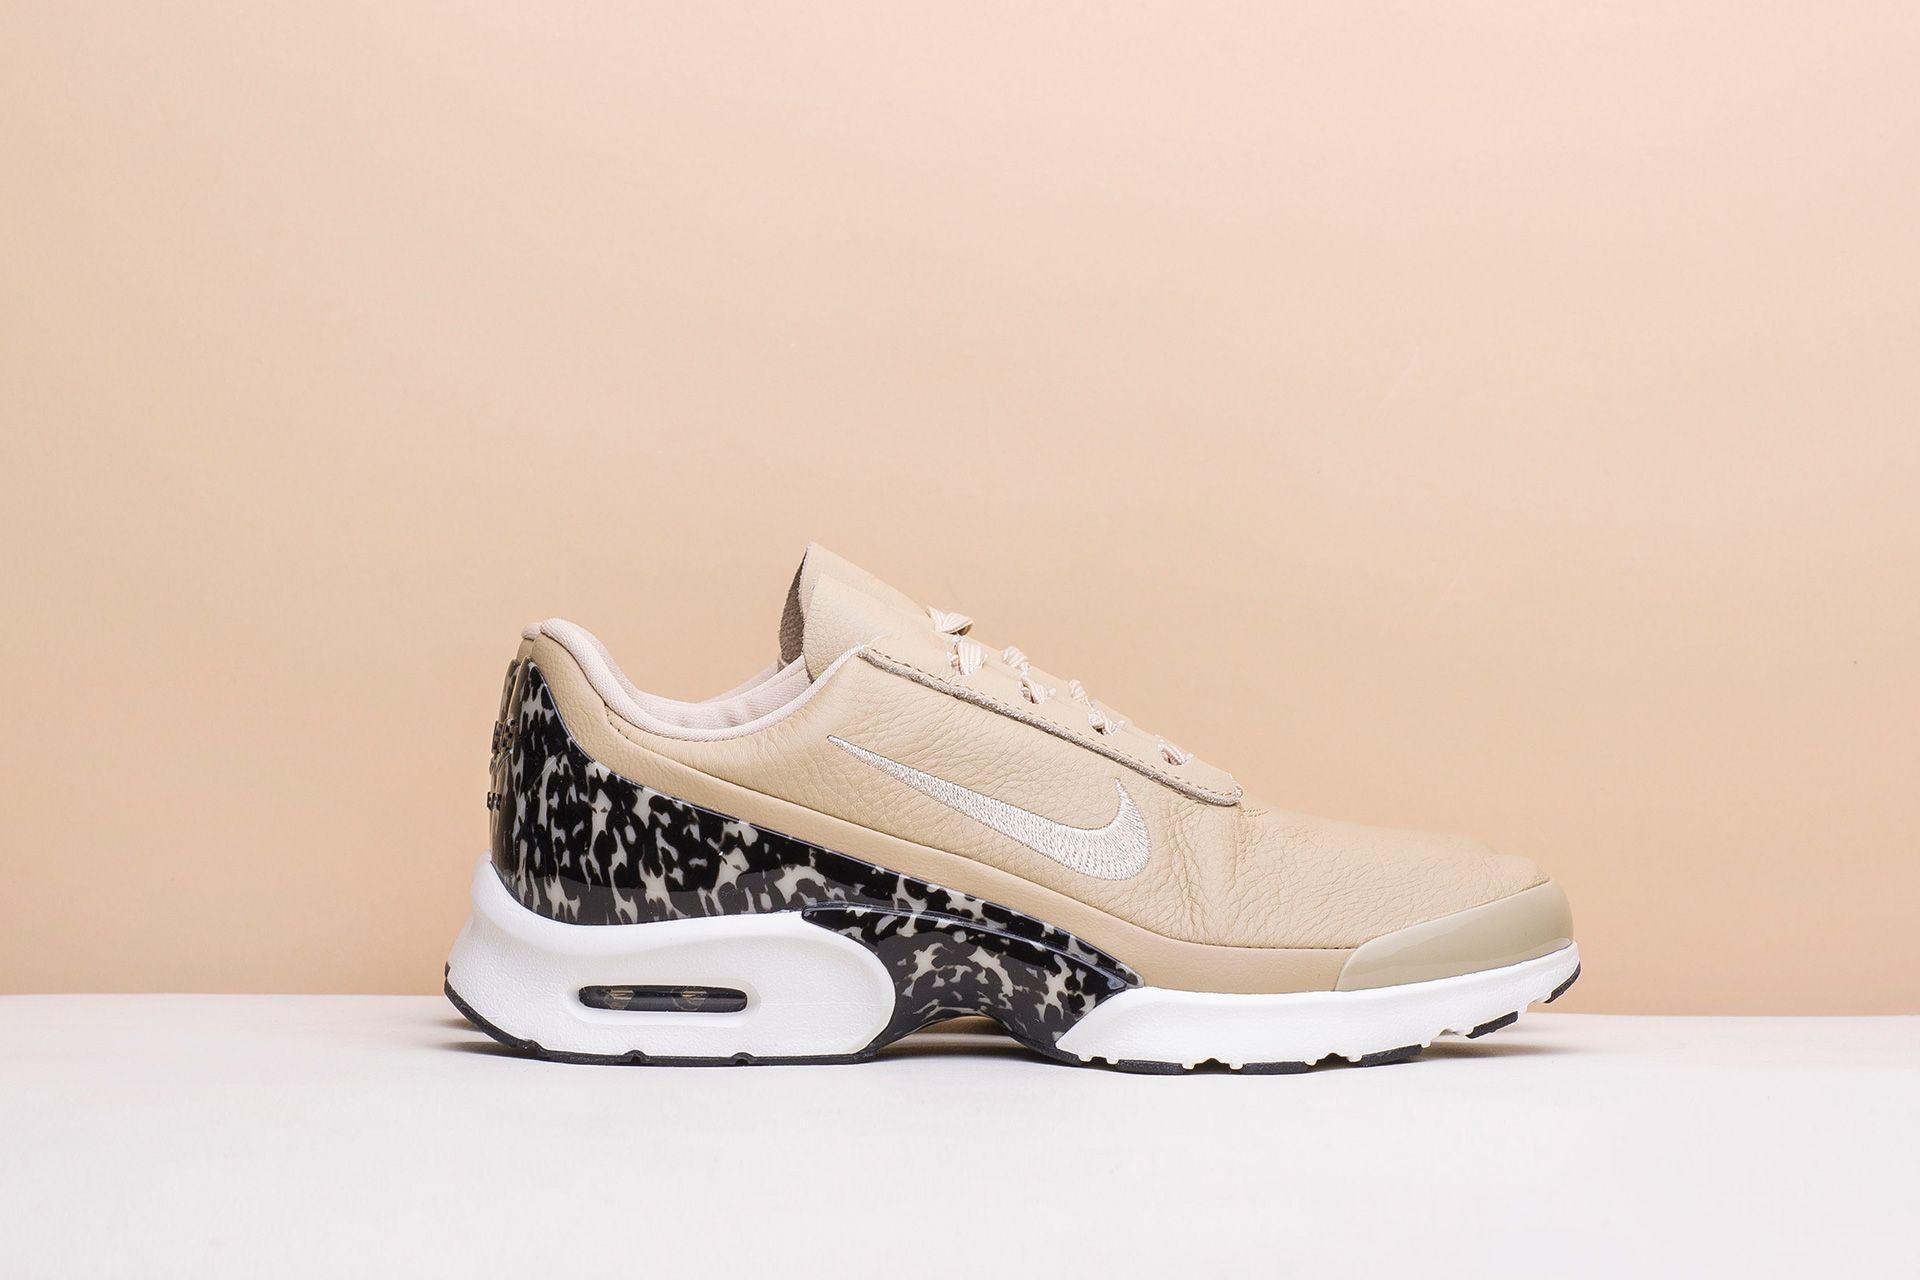 e0d4deb6 ... Купить женские бежевые кроссовки Nike WMNS Air Max Jewell LX - фото 2  картинки ...